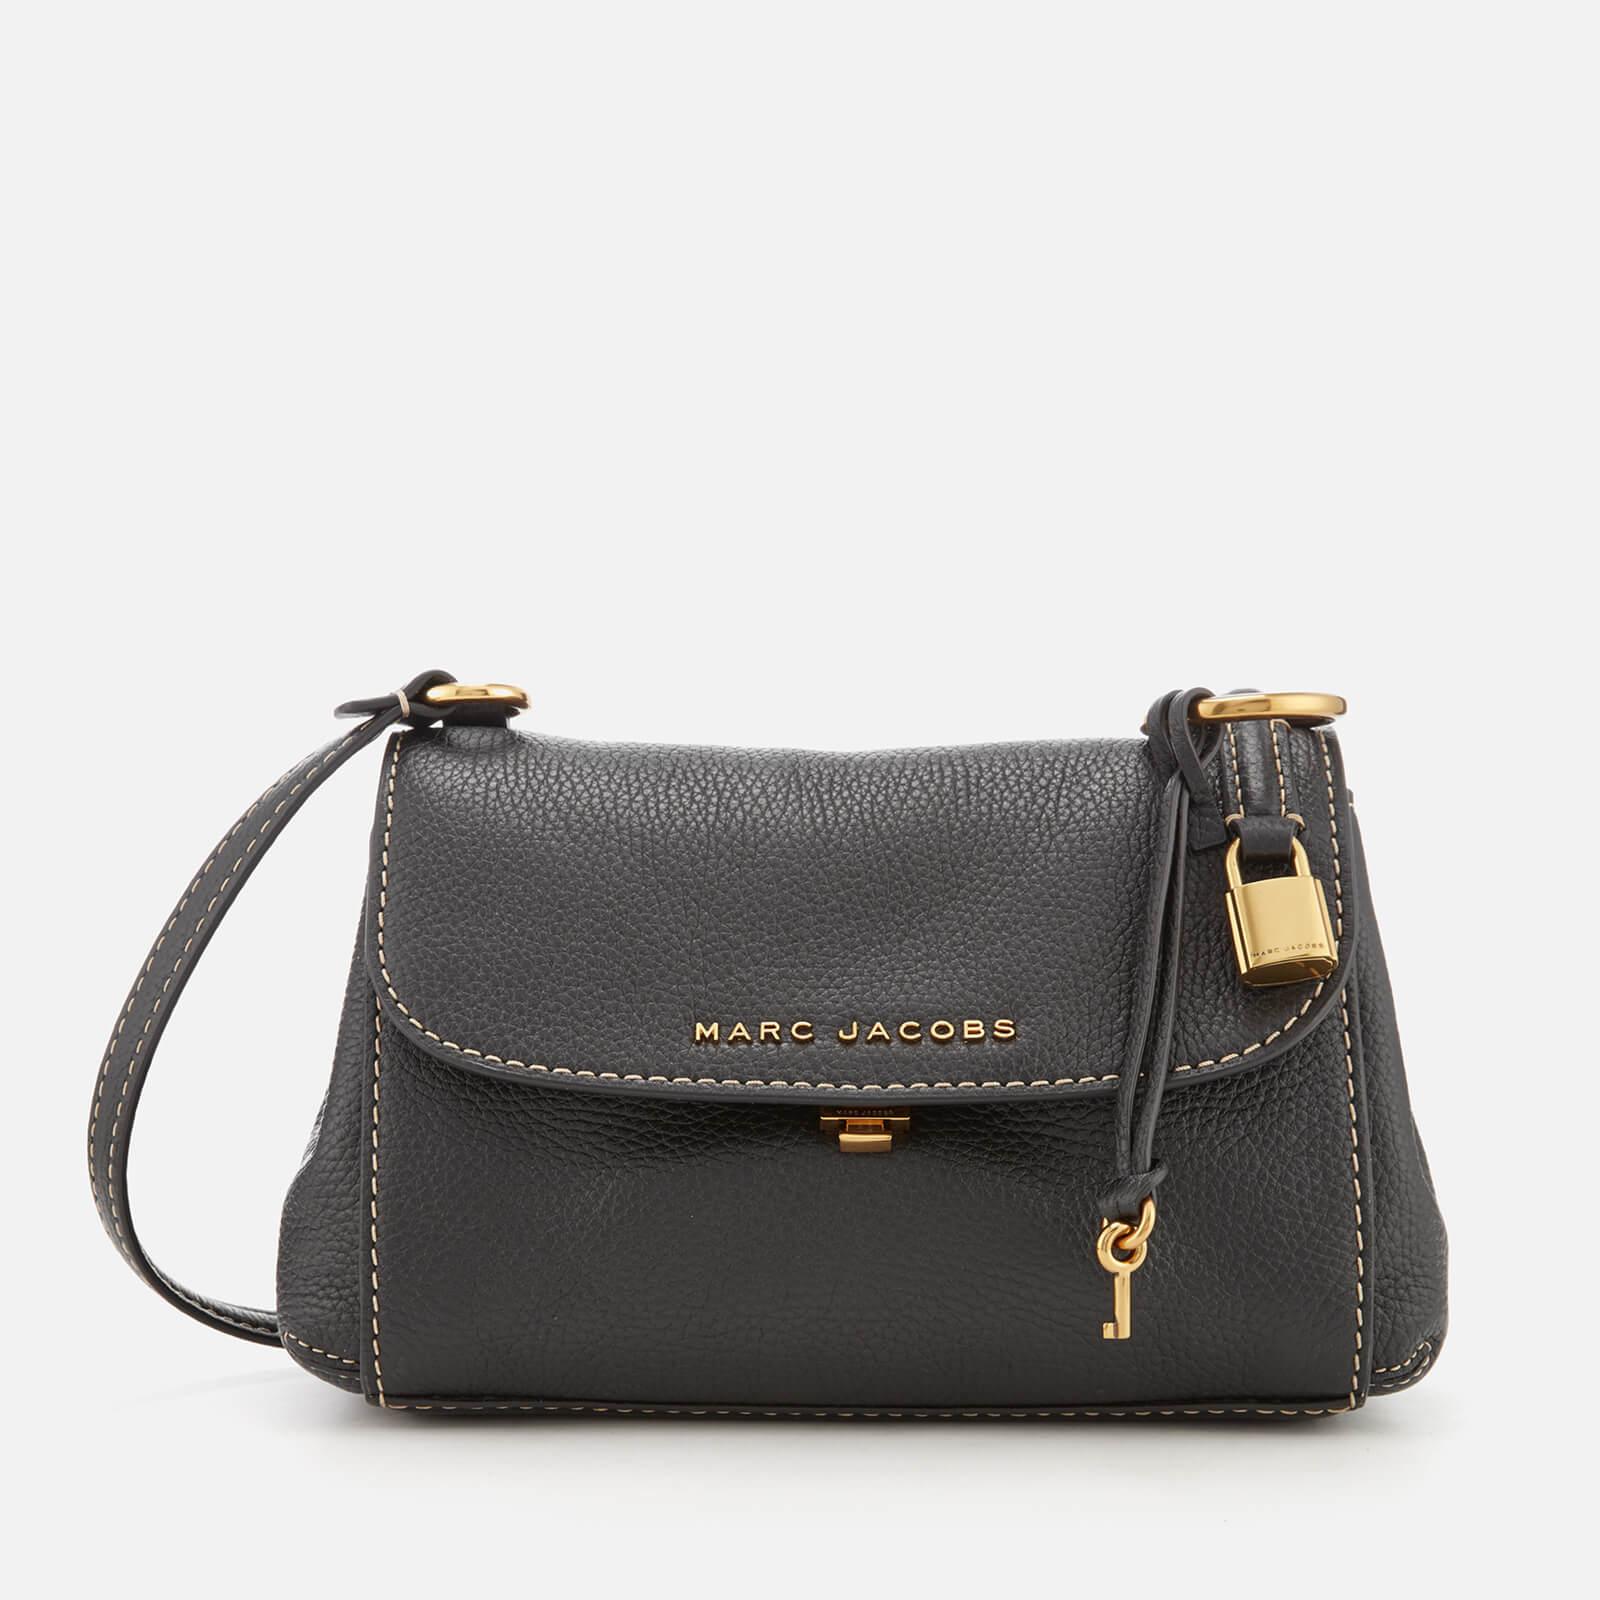 0294340371 Marc Jacobs Women s Mini Boho Grind Bag - Black Gold - Free UK Delivery  over £50